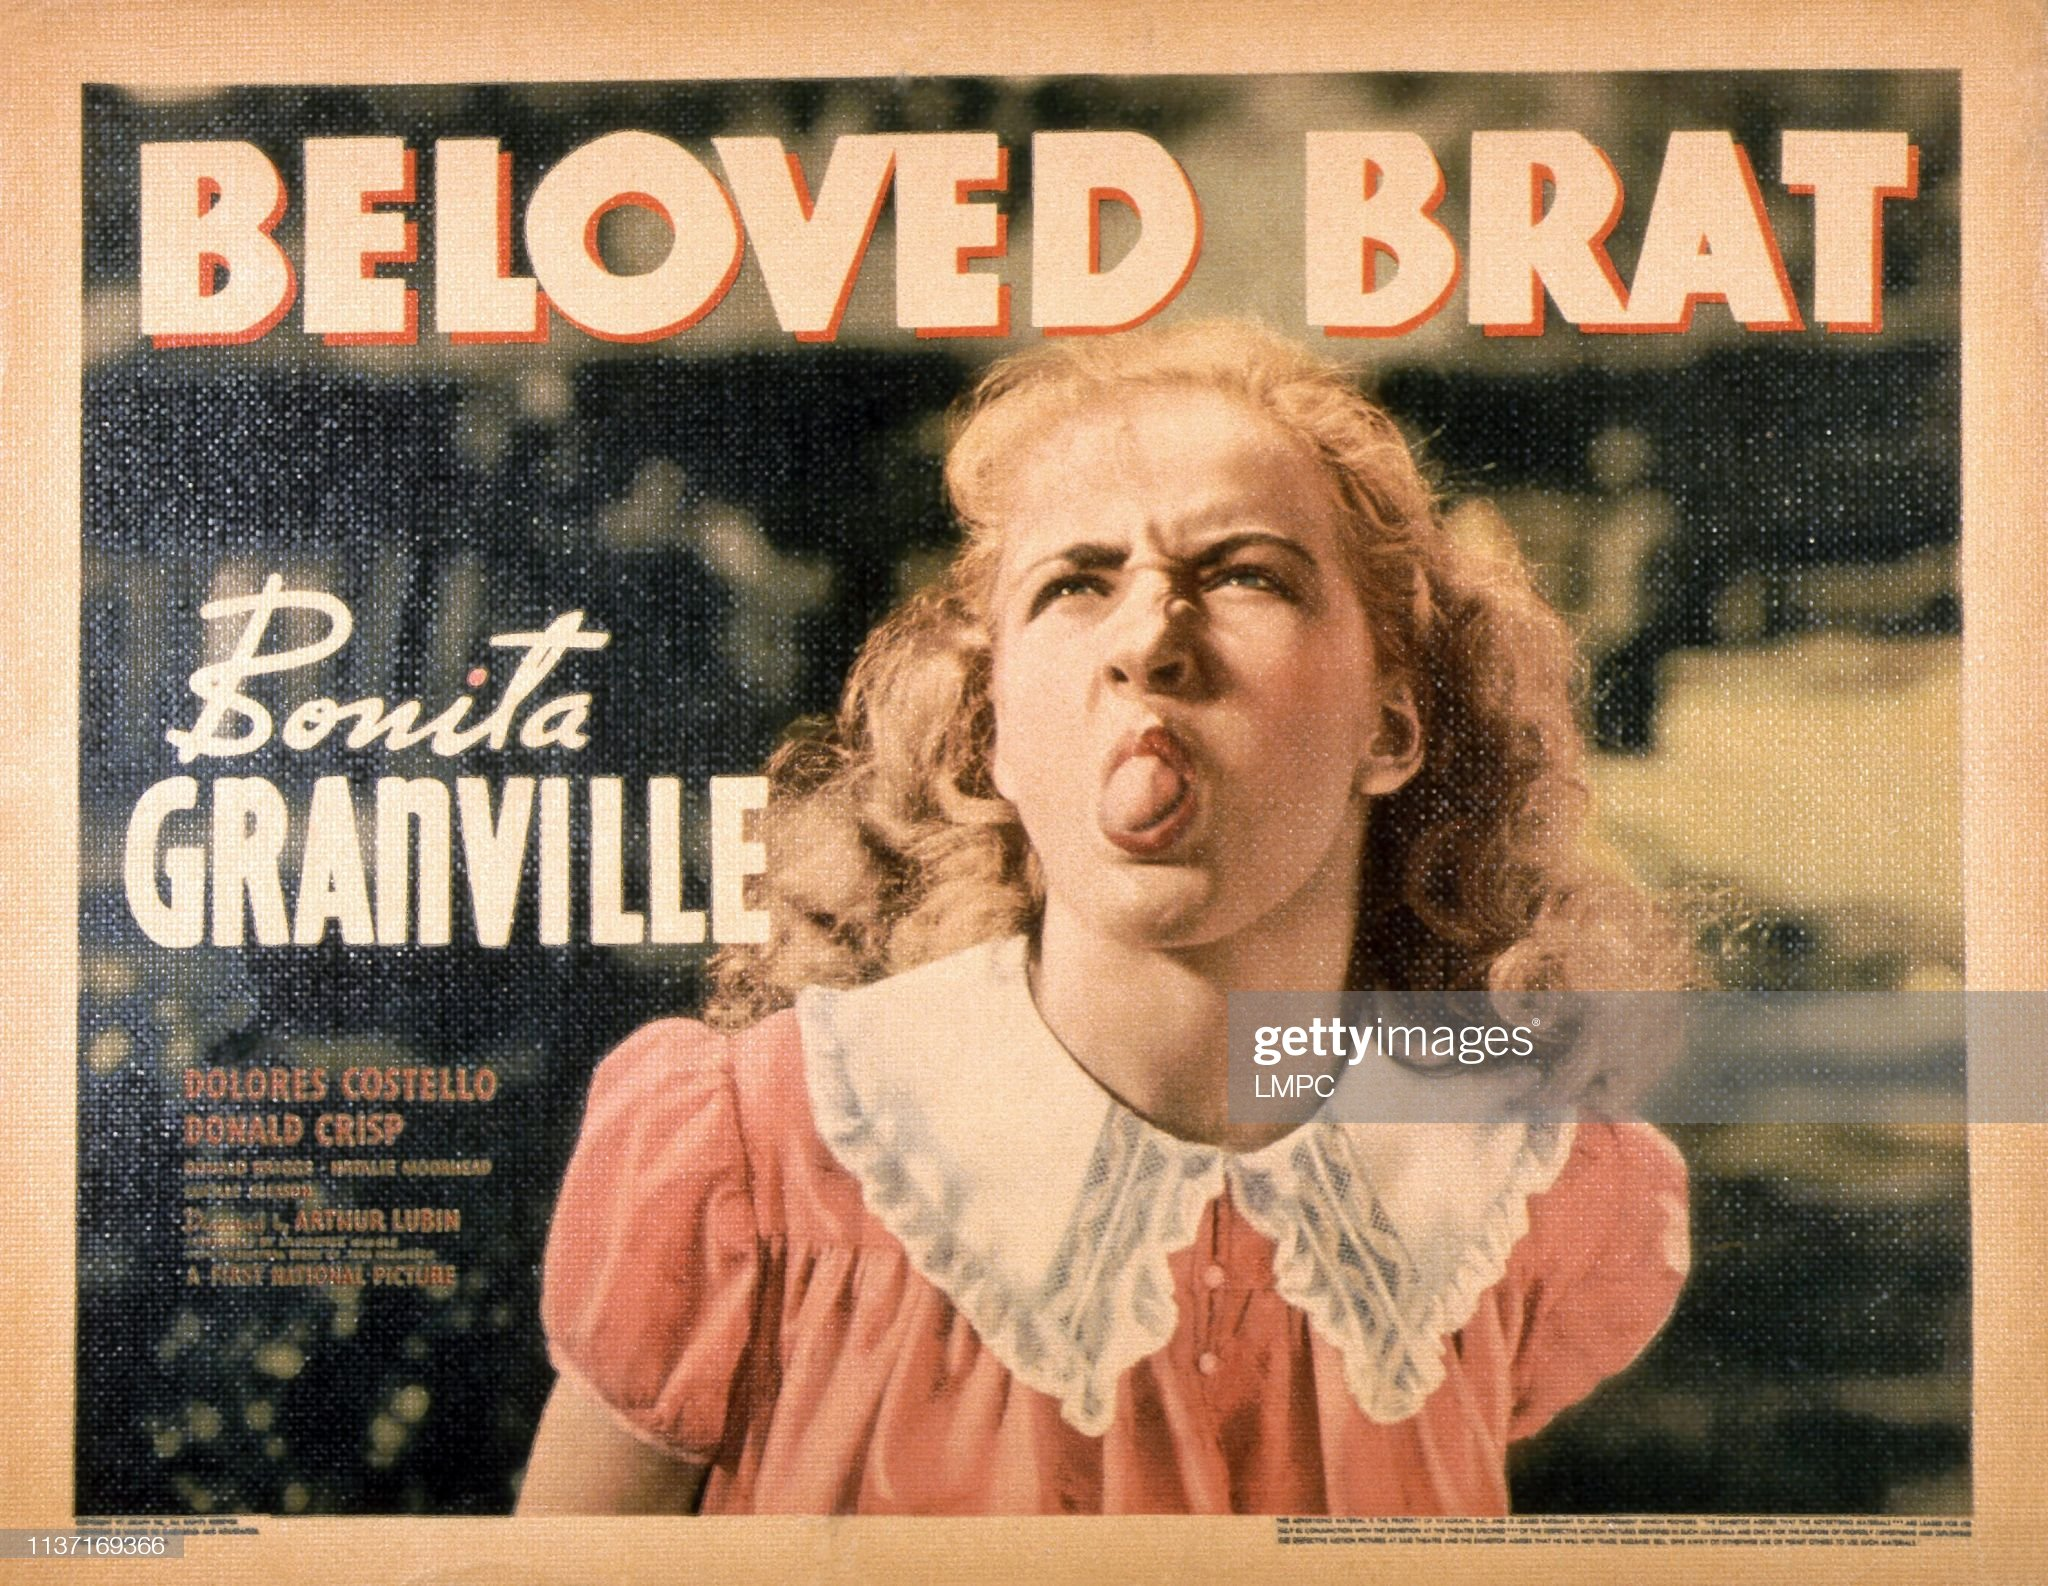 beloved-brat-poster-bonita-granville-193